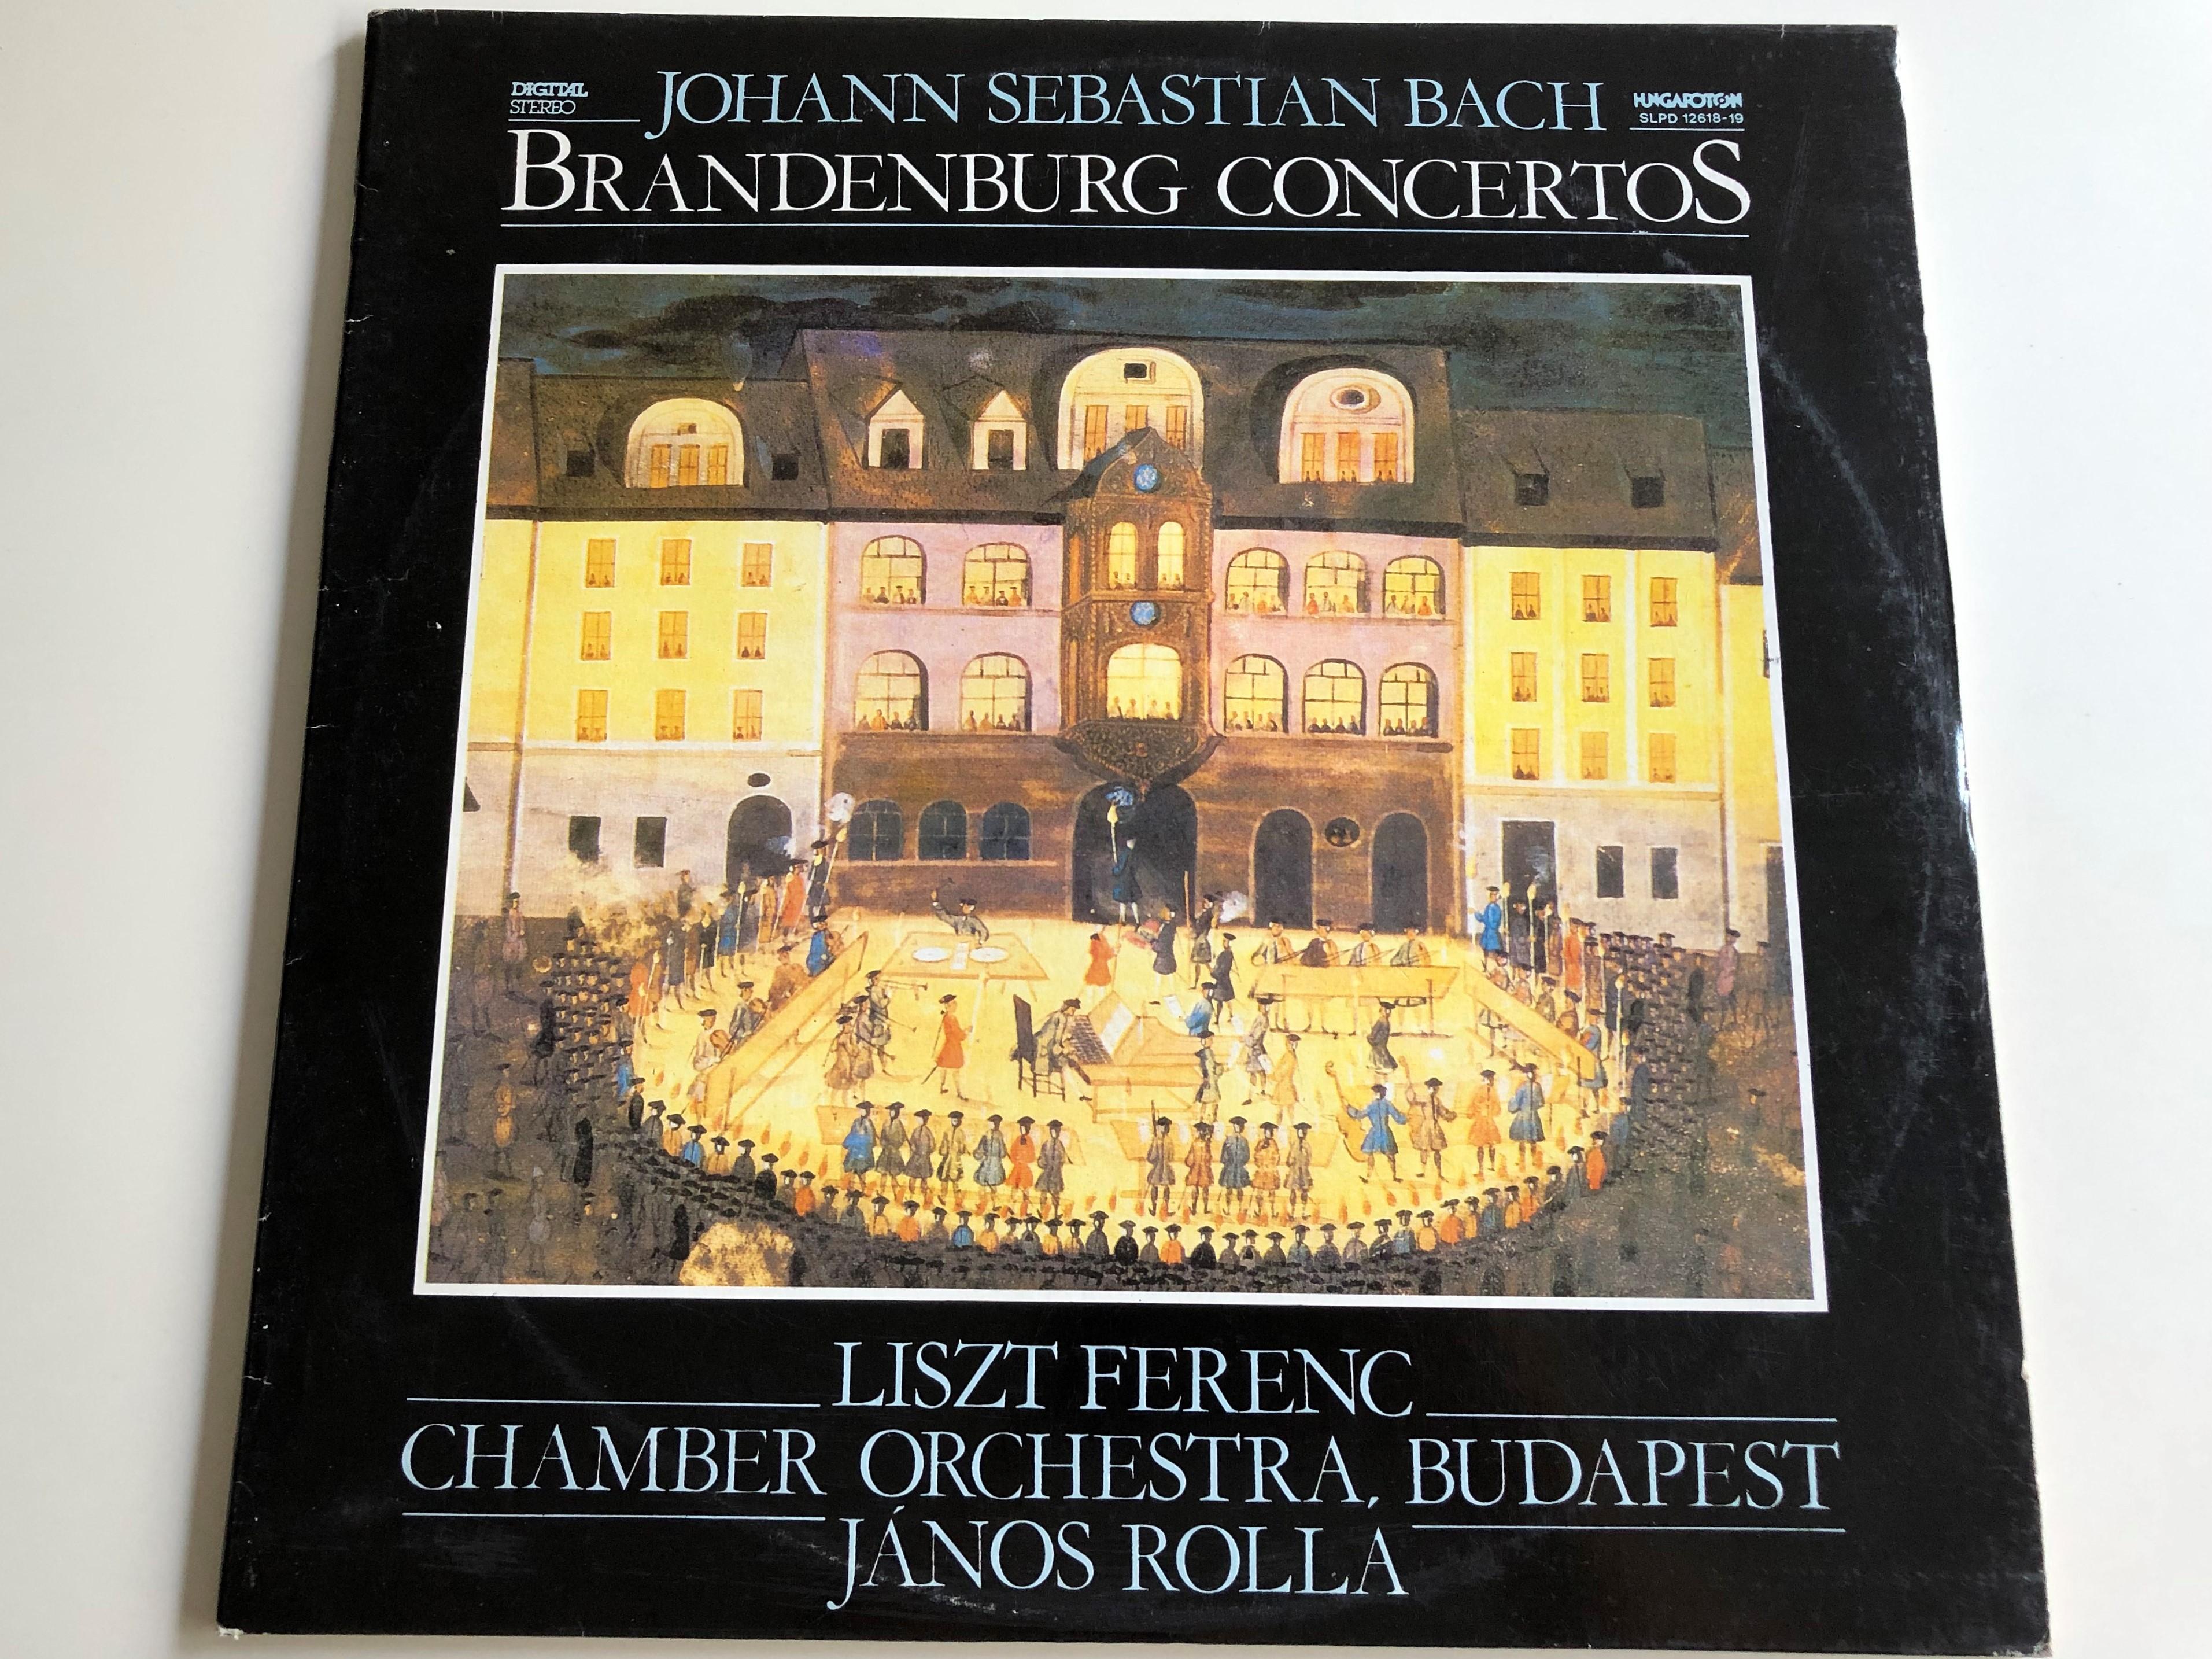 johann-sebastian-bach-brandenburg-concertos-2-x-lp-stereo-liszt-ferenc-chamber-orchestra-budapest-conducted-by-j-nos-rolla-hungaroton-1987-slpd-12518-19-1-.jpg